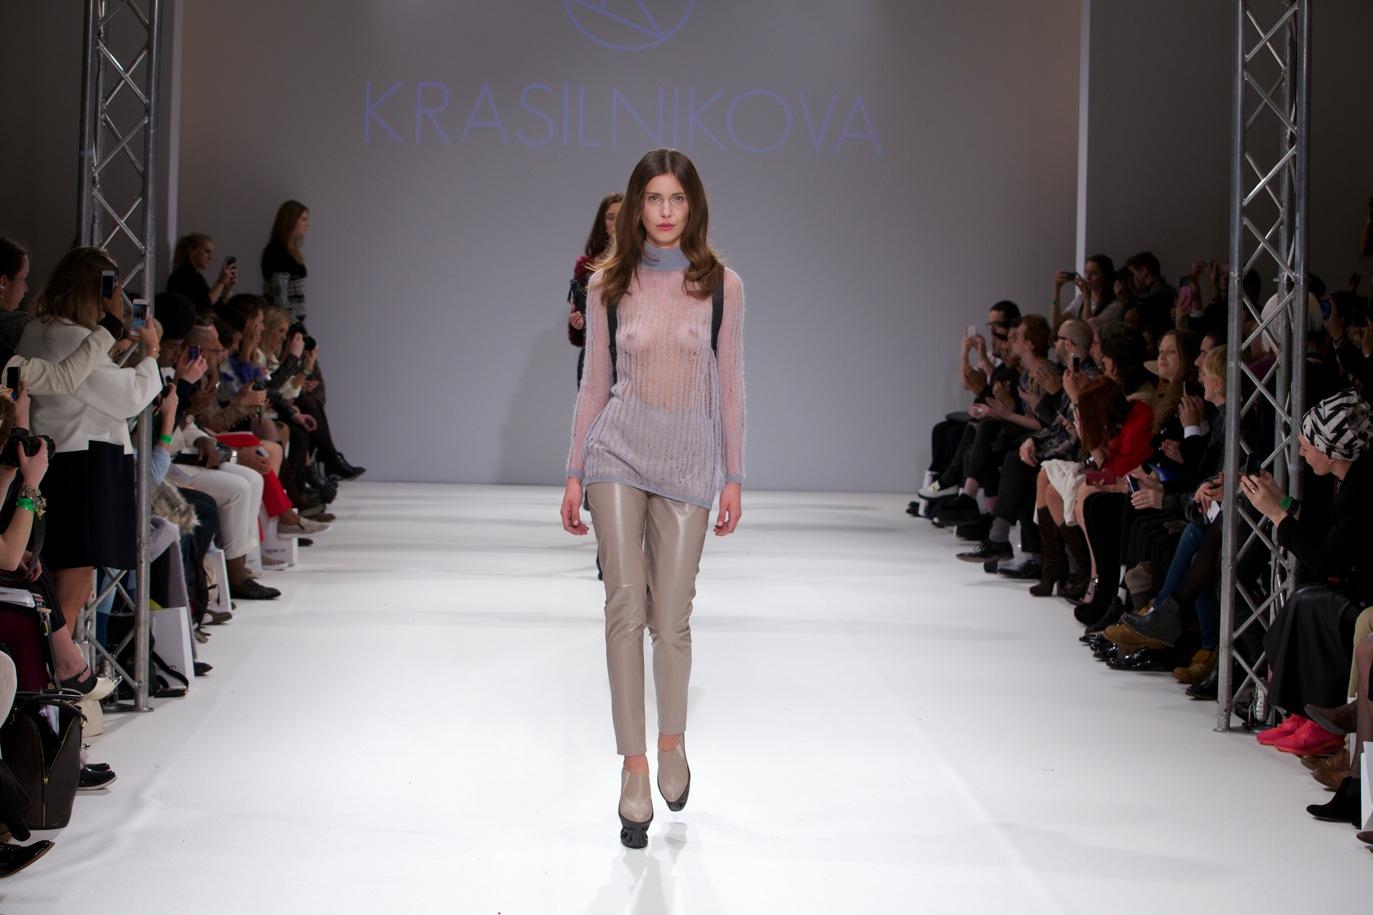 Kiev Fashion Days A-W 2014 (c) Marc aitken 2014  72.jpg